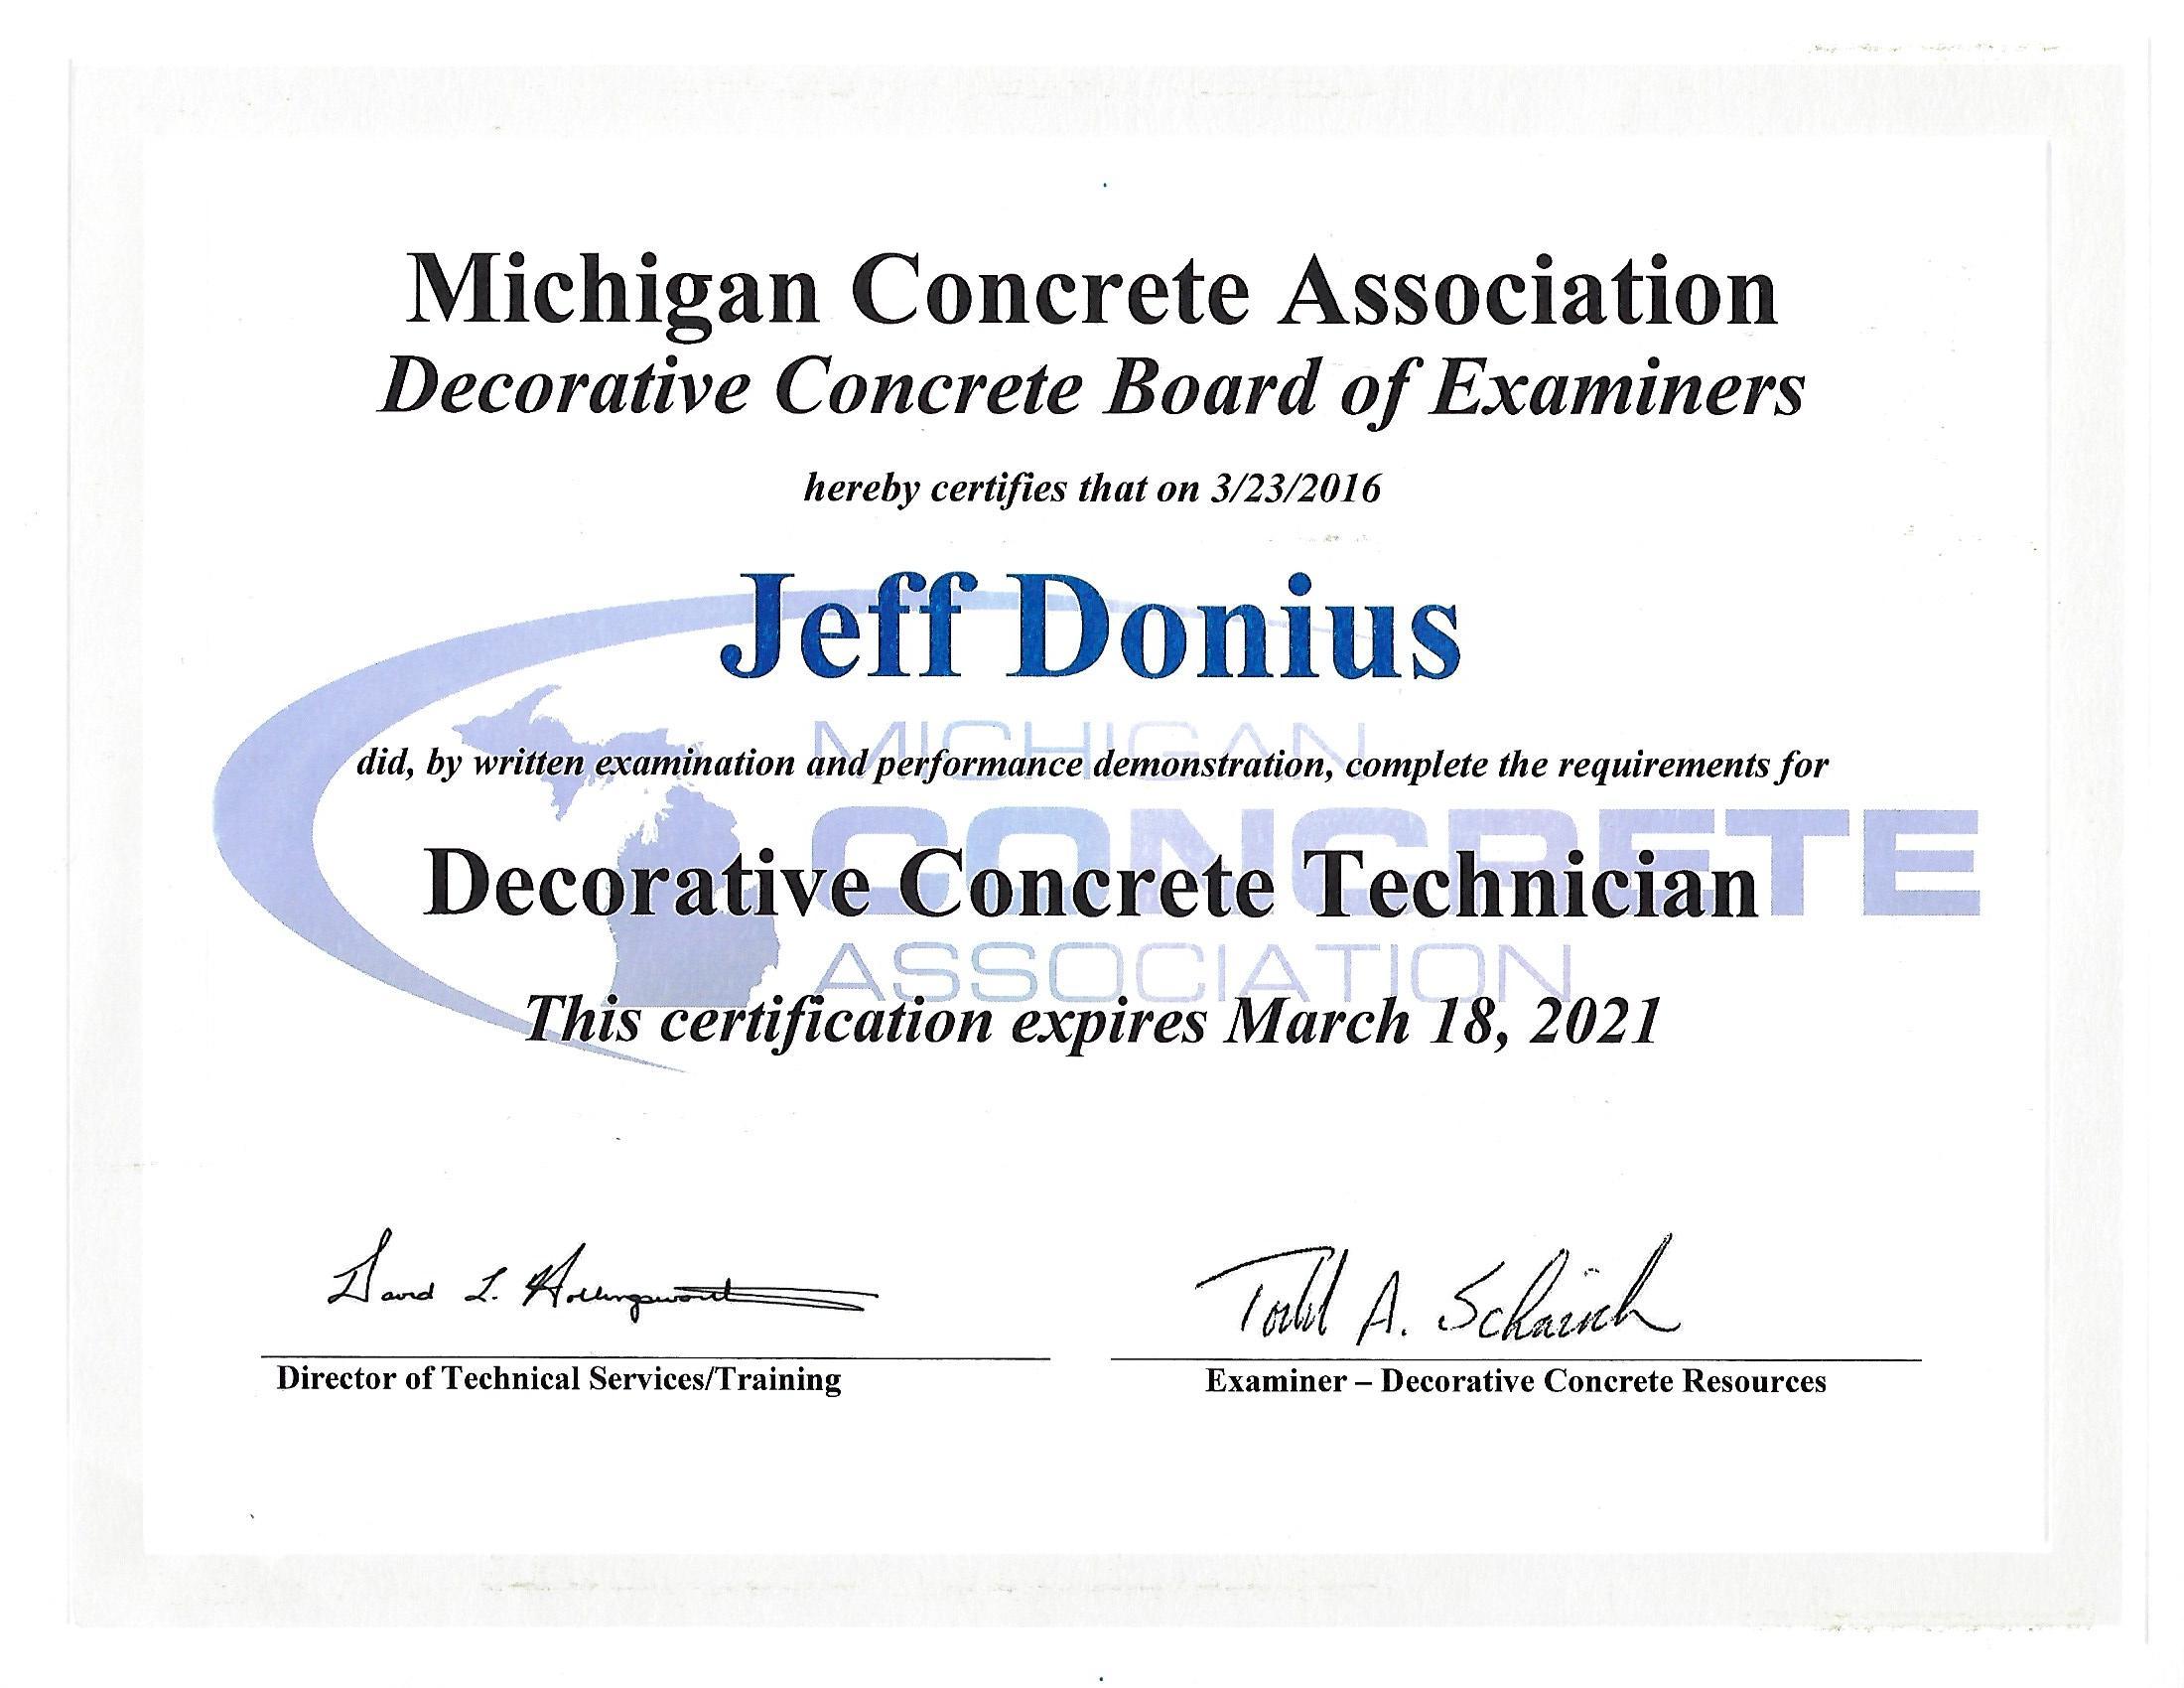 Decorative Concrete Training Certificate From Michigan Concrete Association (MCA)